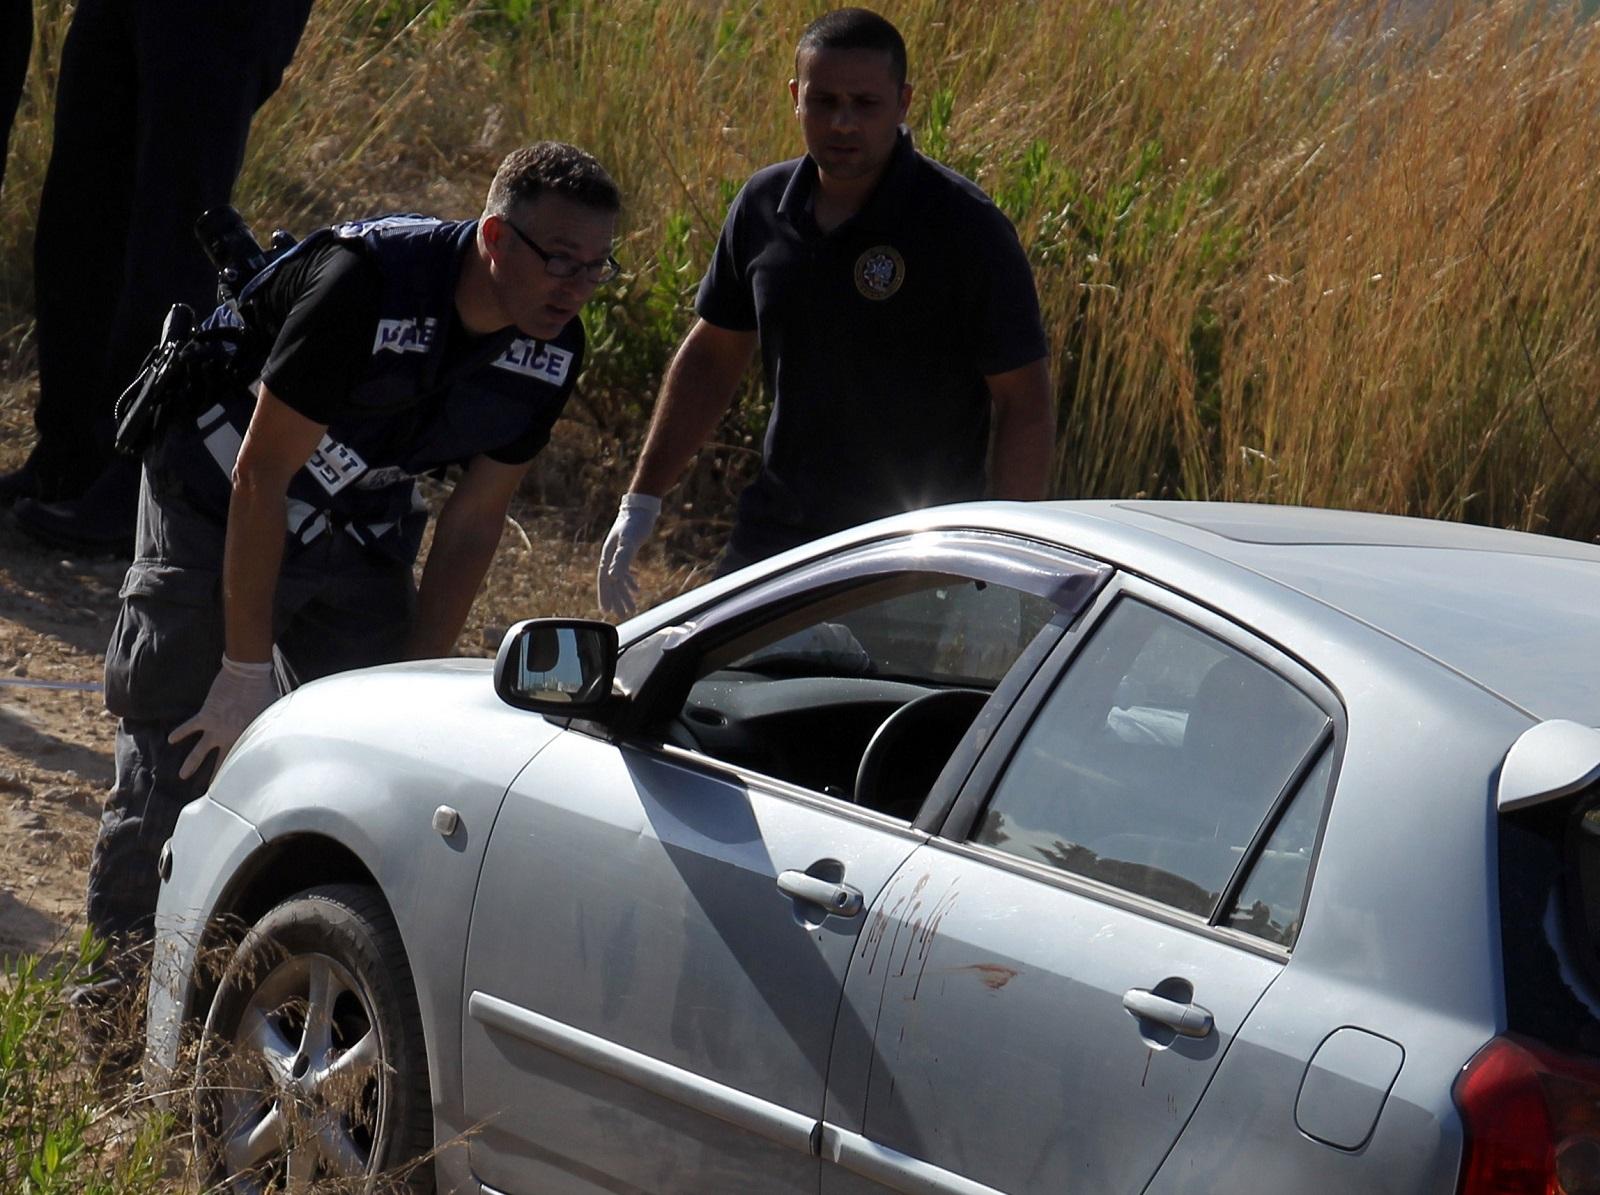 Attack near Dolev settlement, West Bank